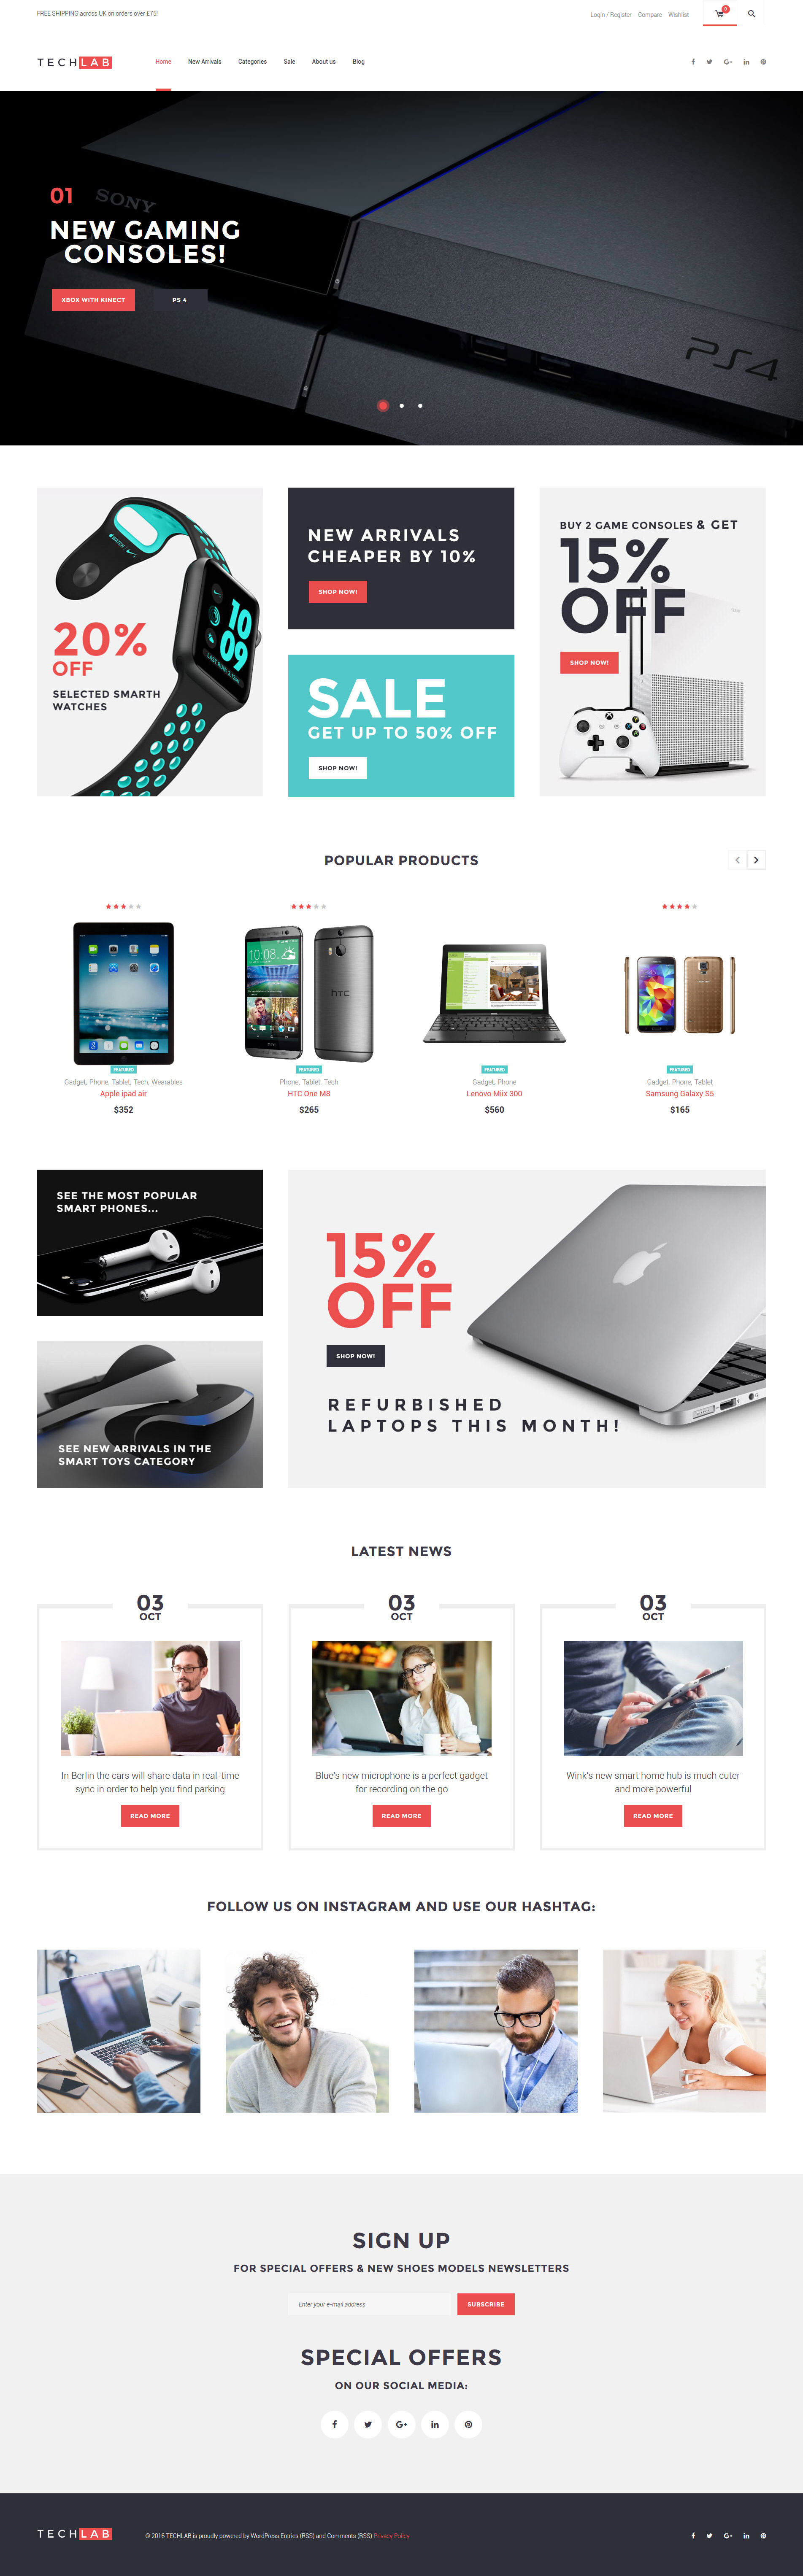 TechLab - Innovative Electronics Store №61303 - скриншот